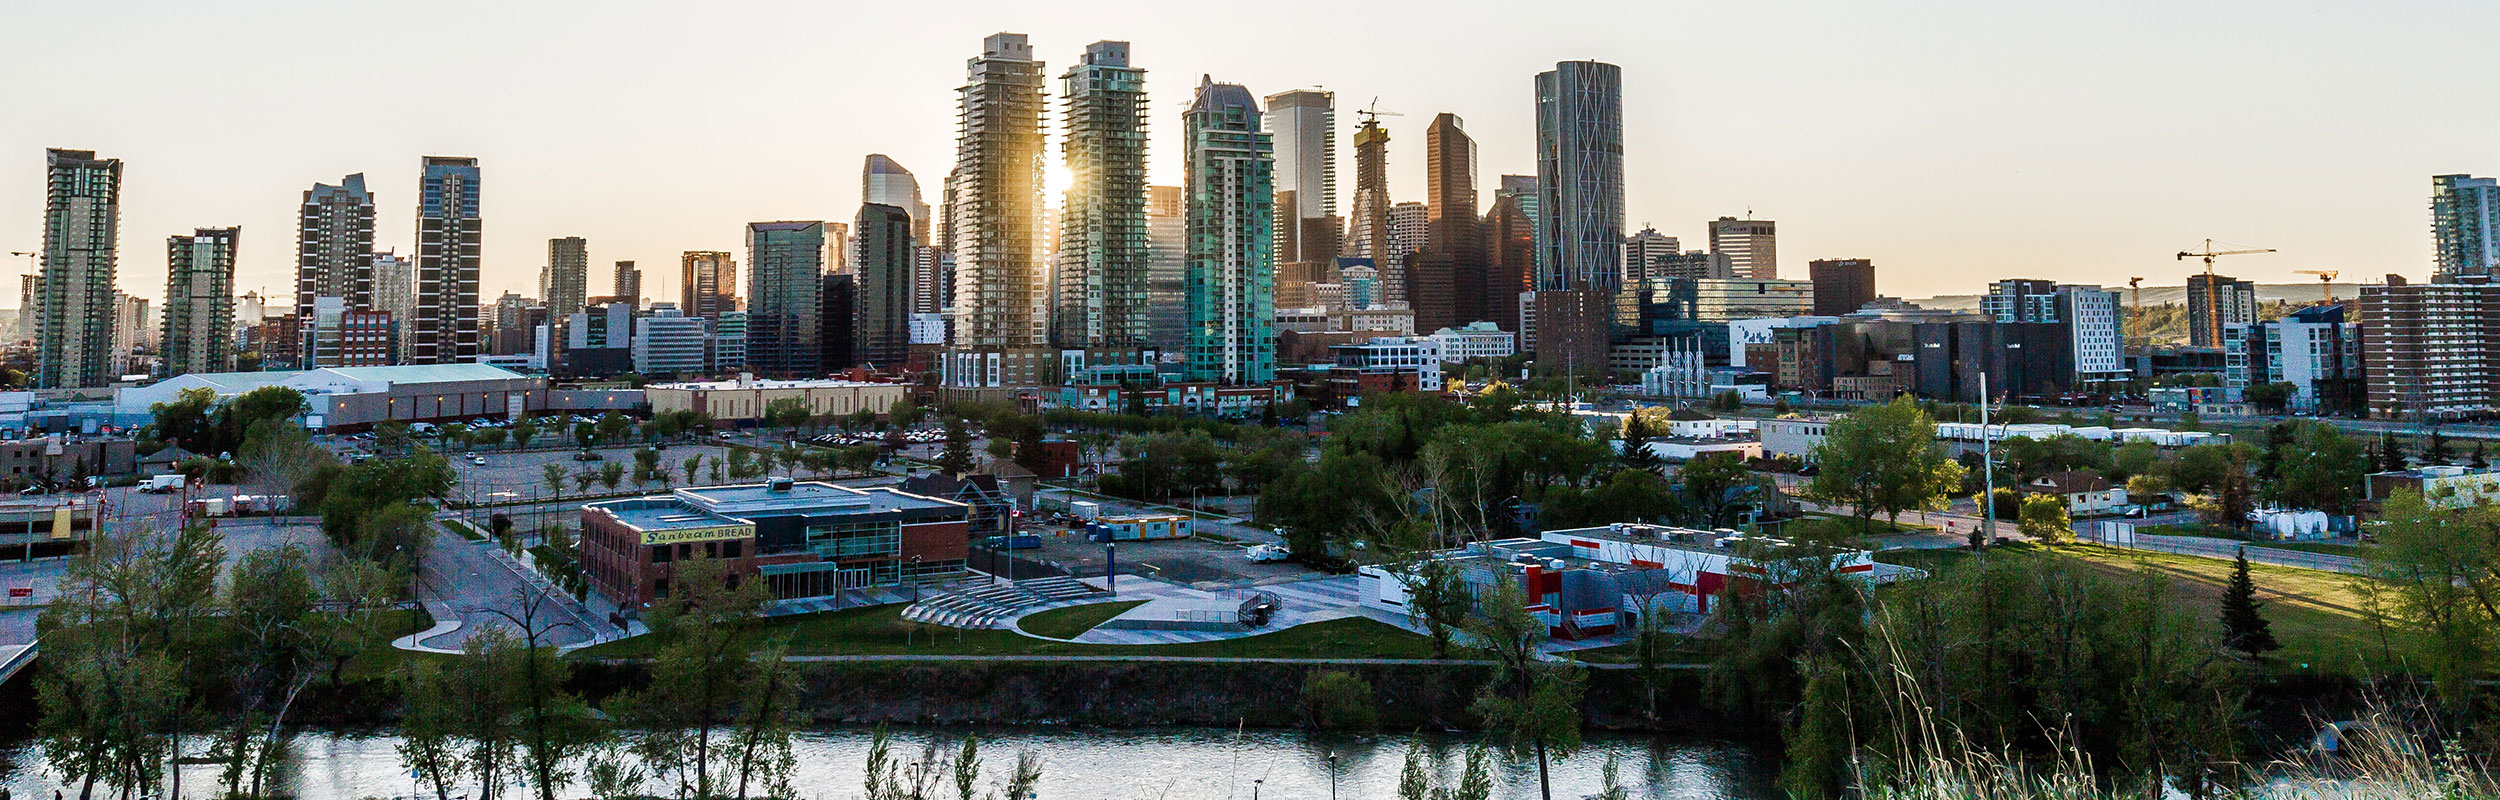 Skyline of Cochrane, Alberta, Canada